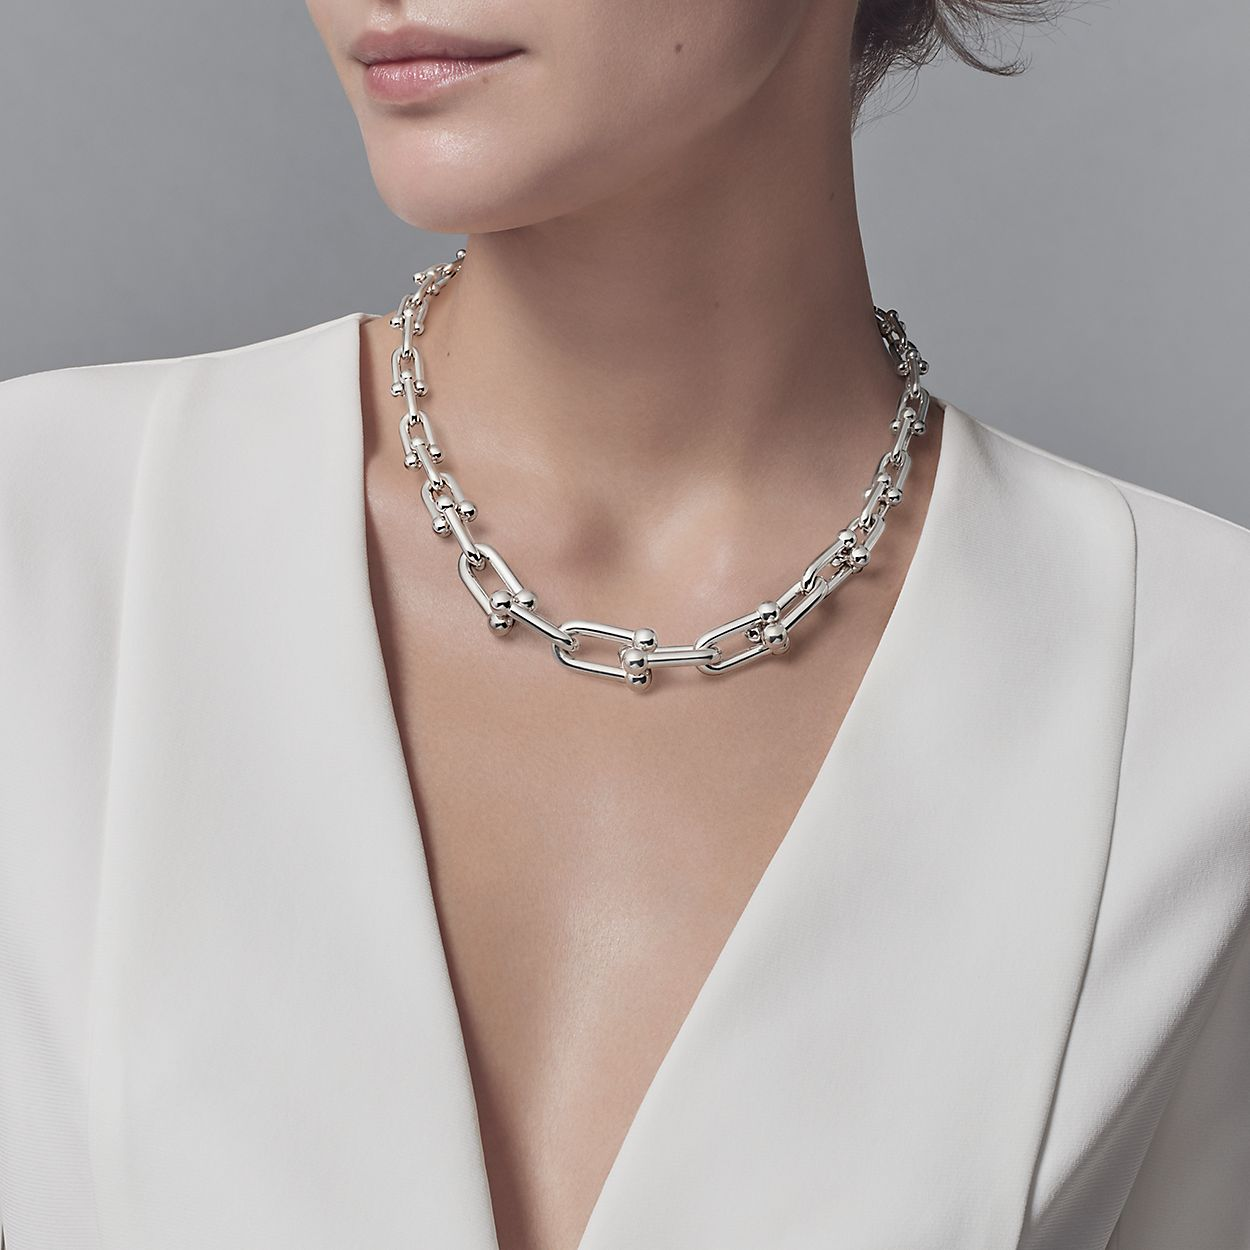 746a7331e Tiffany HardWear Sterling Silver Link Necklace | Tiffany & Co.